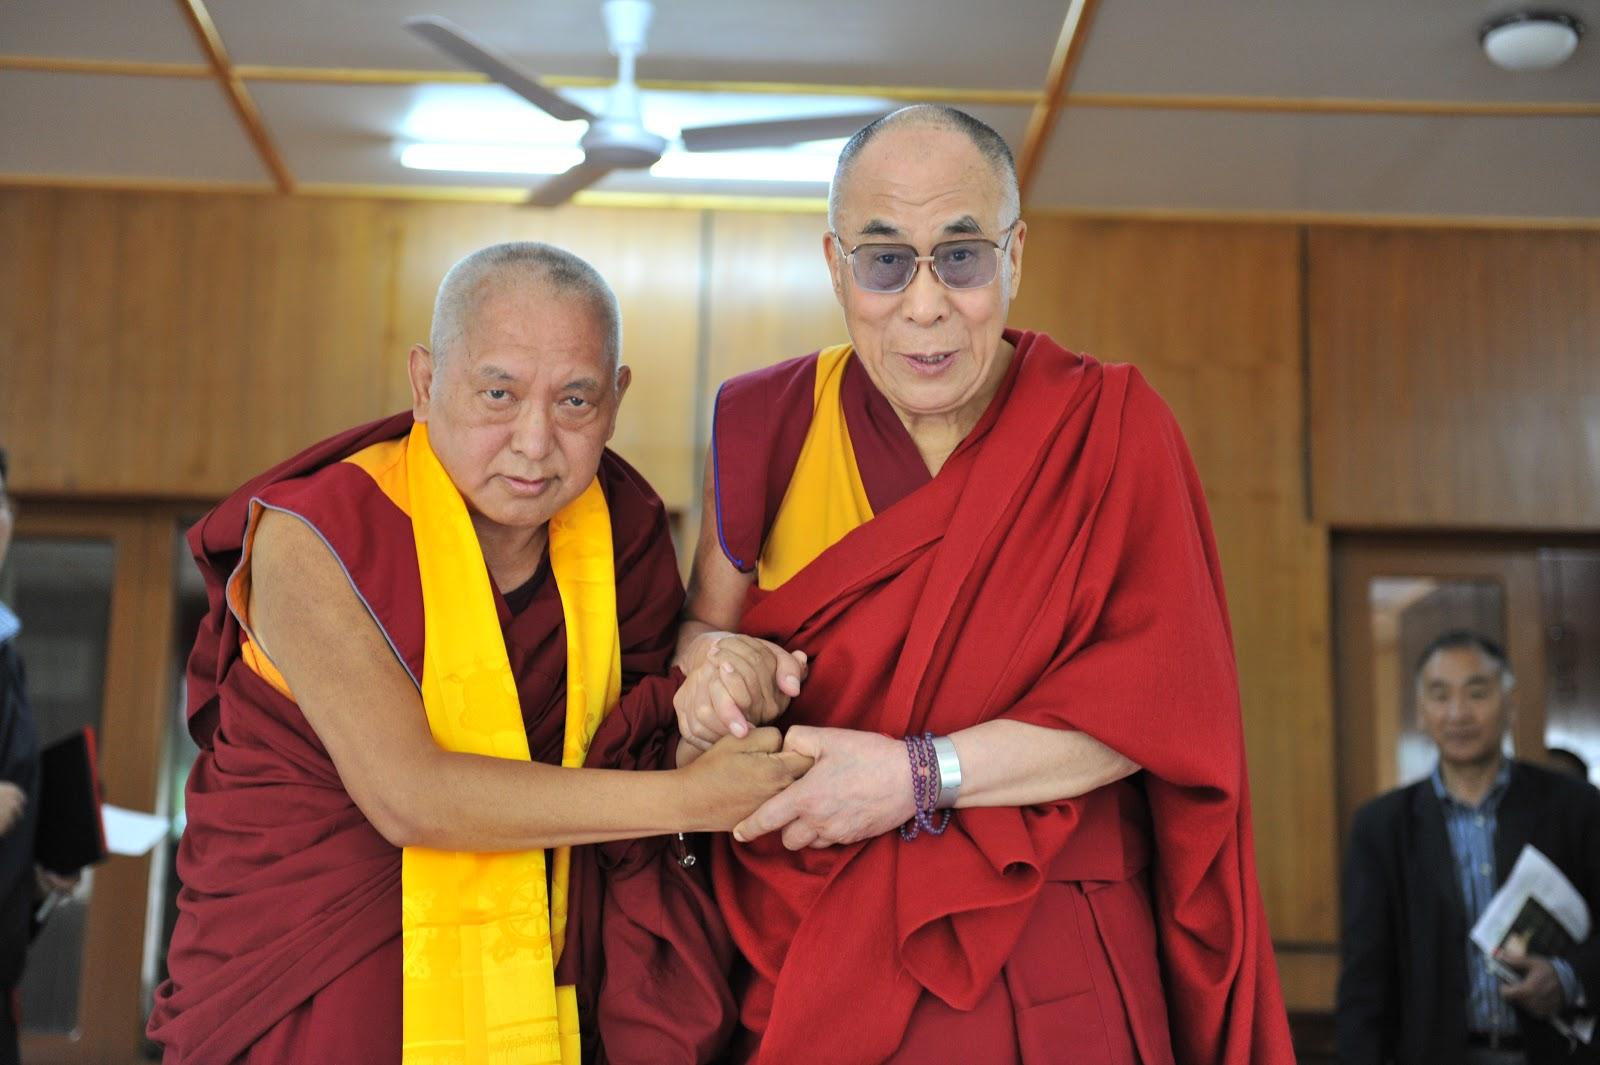 With His Holiness the Dalai Lama 2012